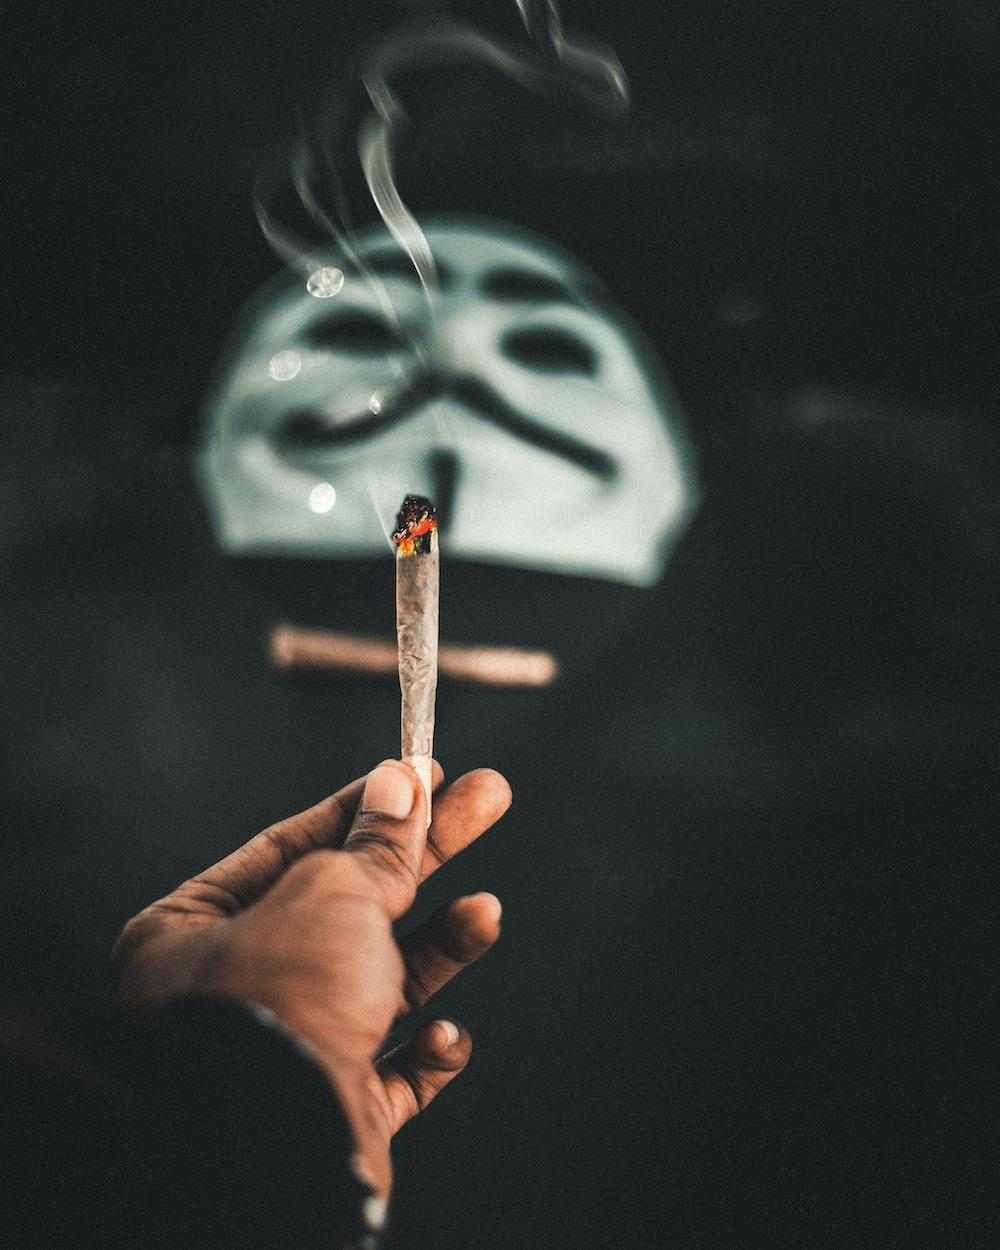 person holding cigarette stick with white smoke